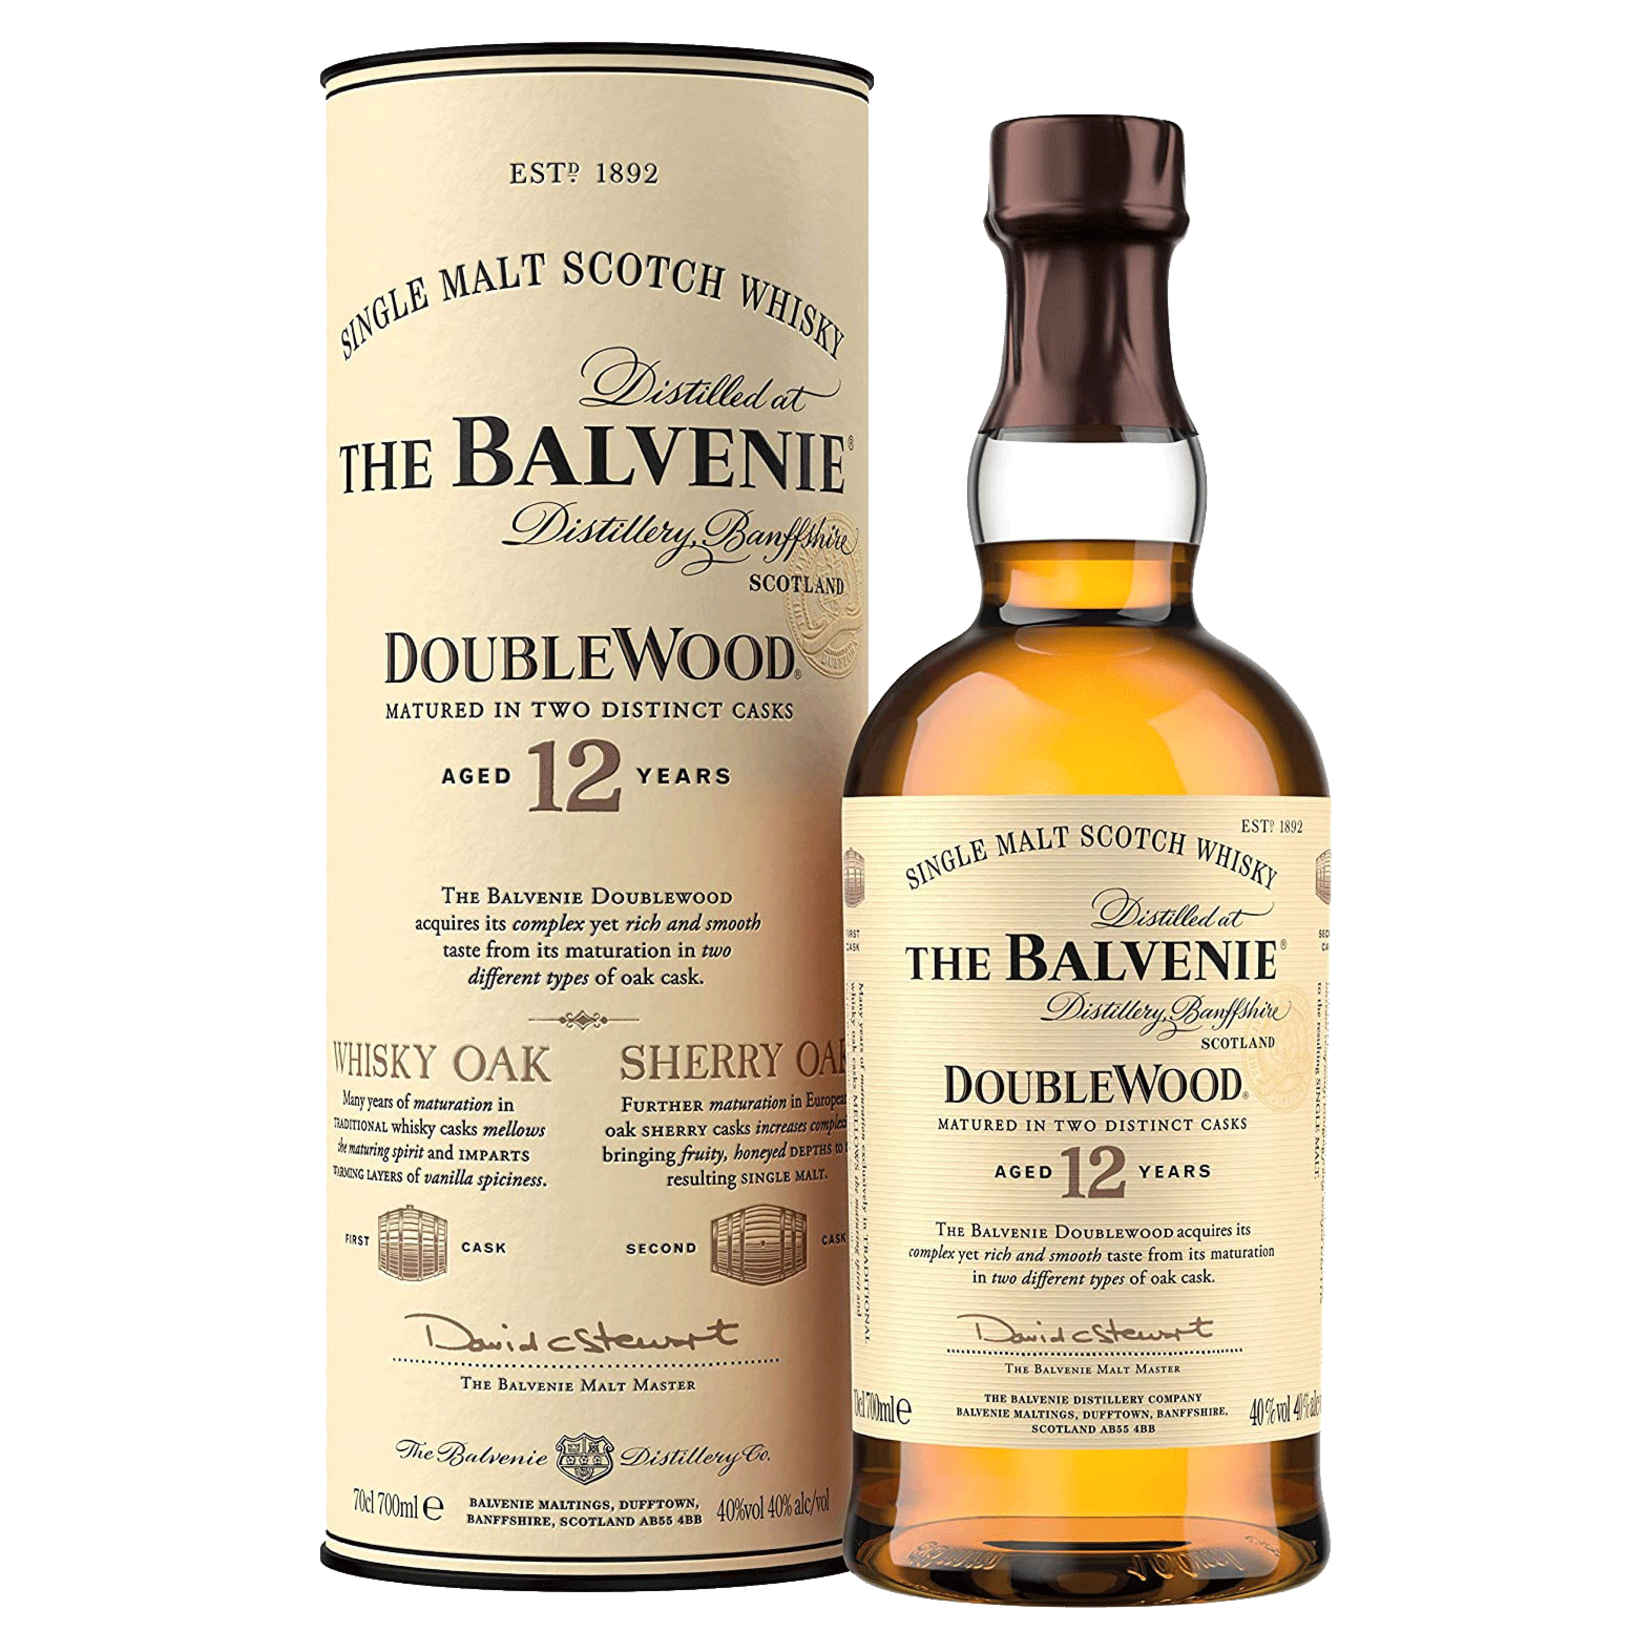 Spirits The Balvenie 12 Year Doublewood Speyside Scotch